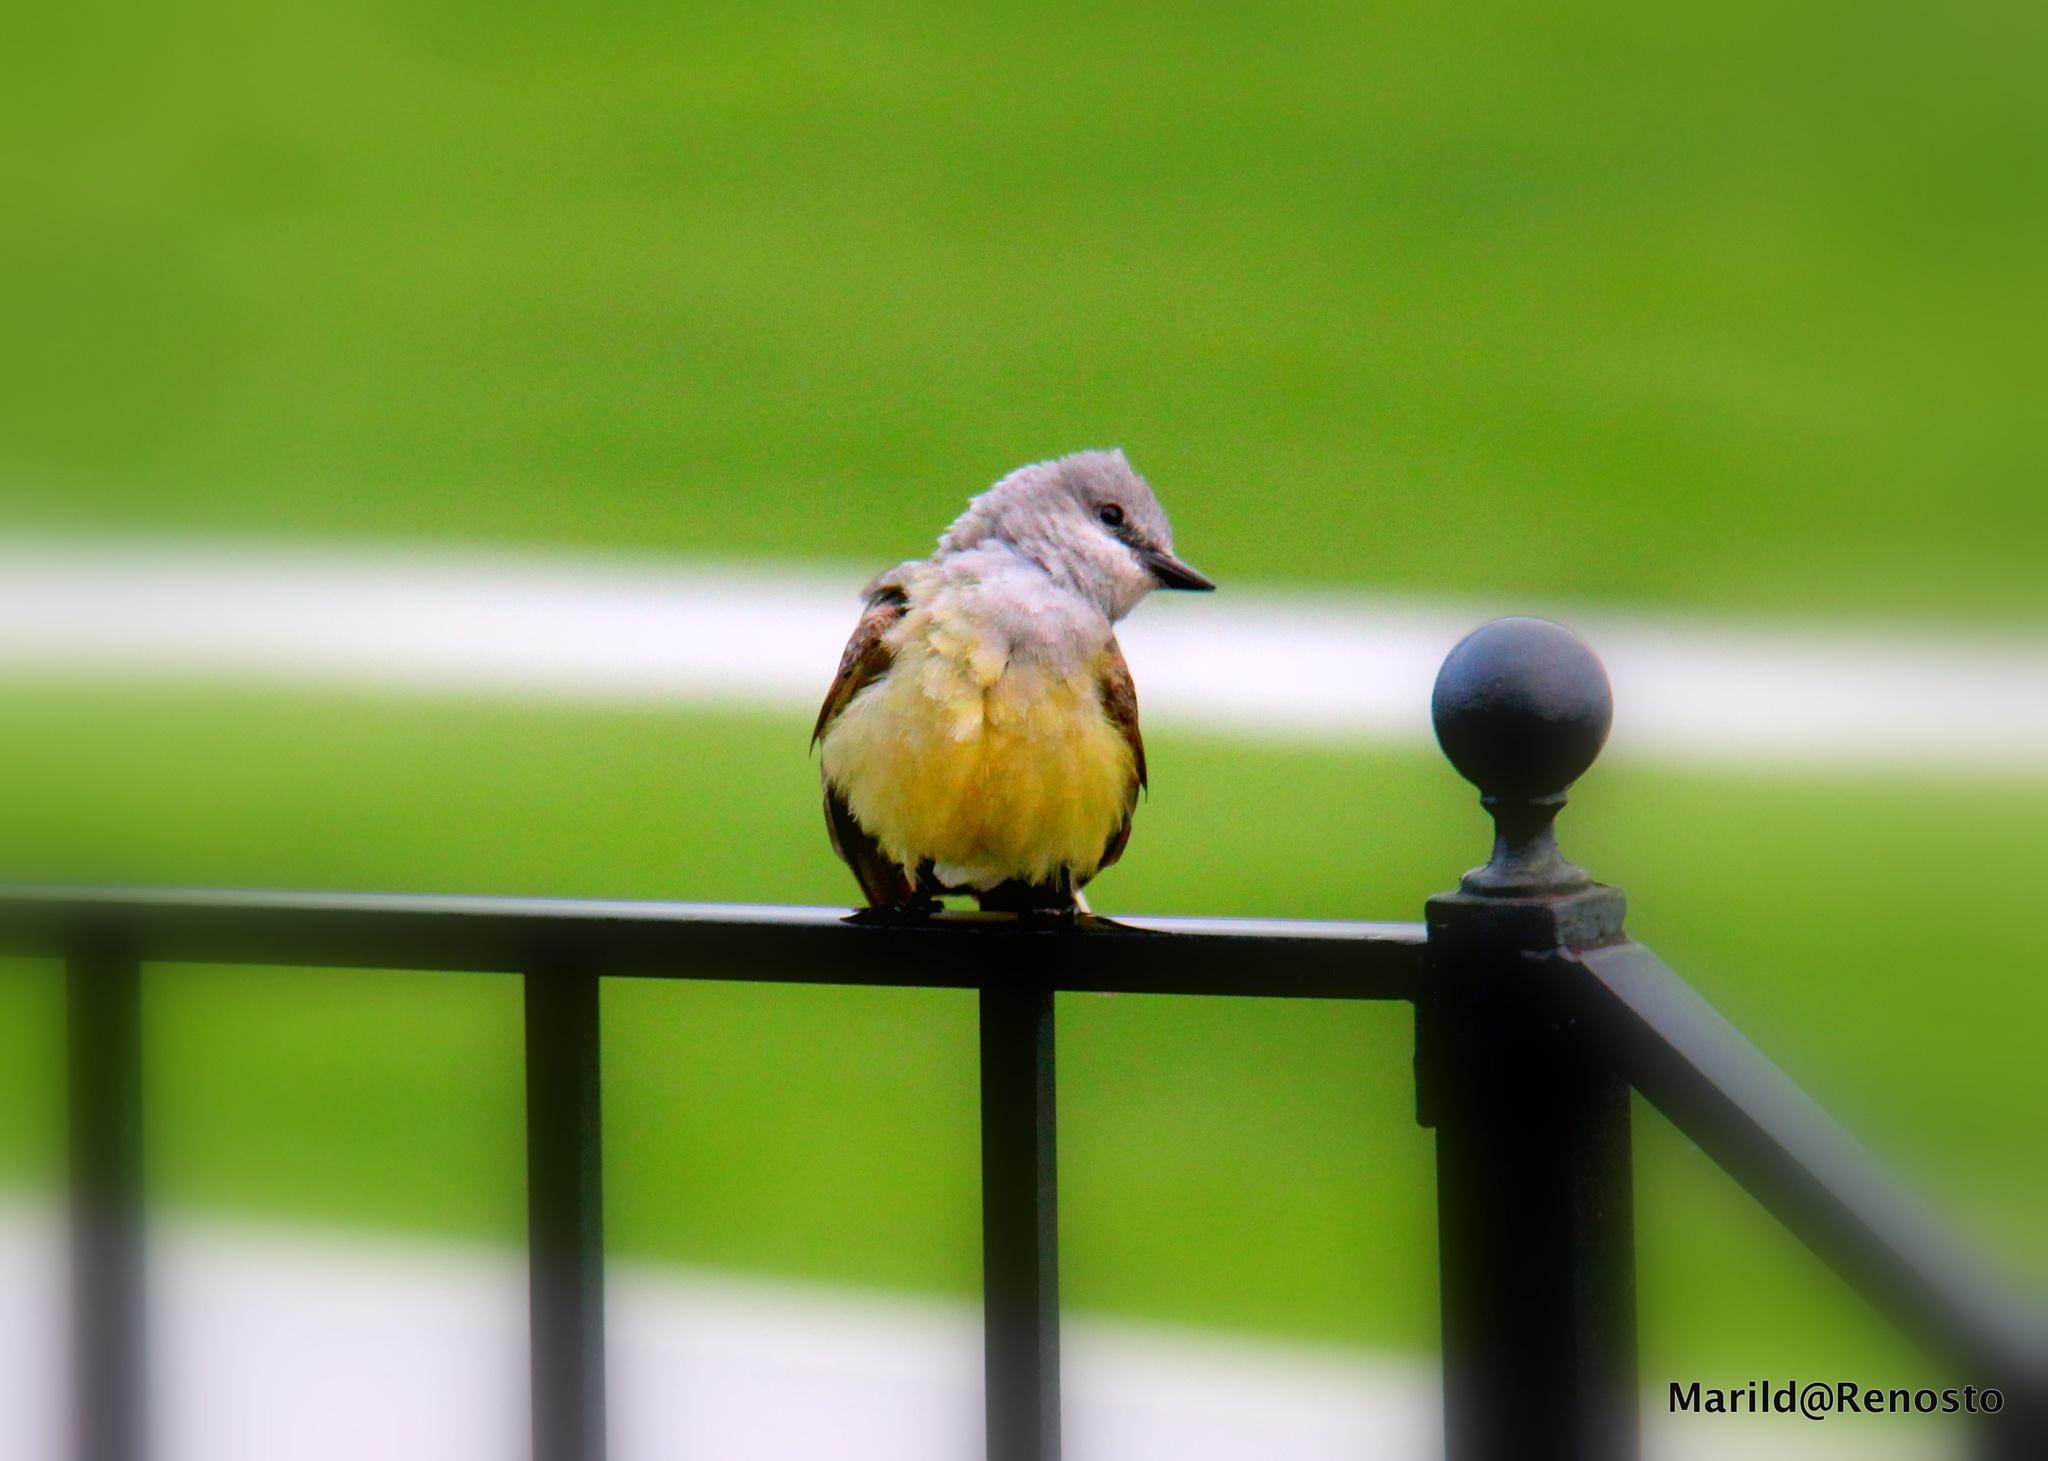 Bird by marilda.renosto